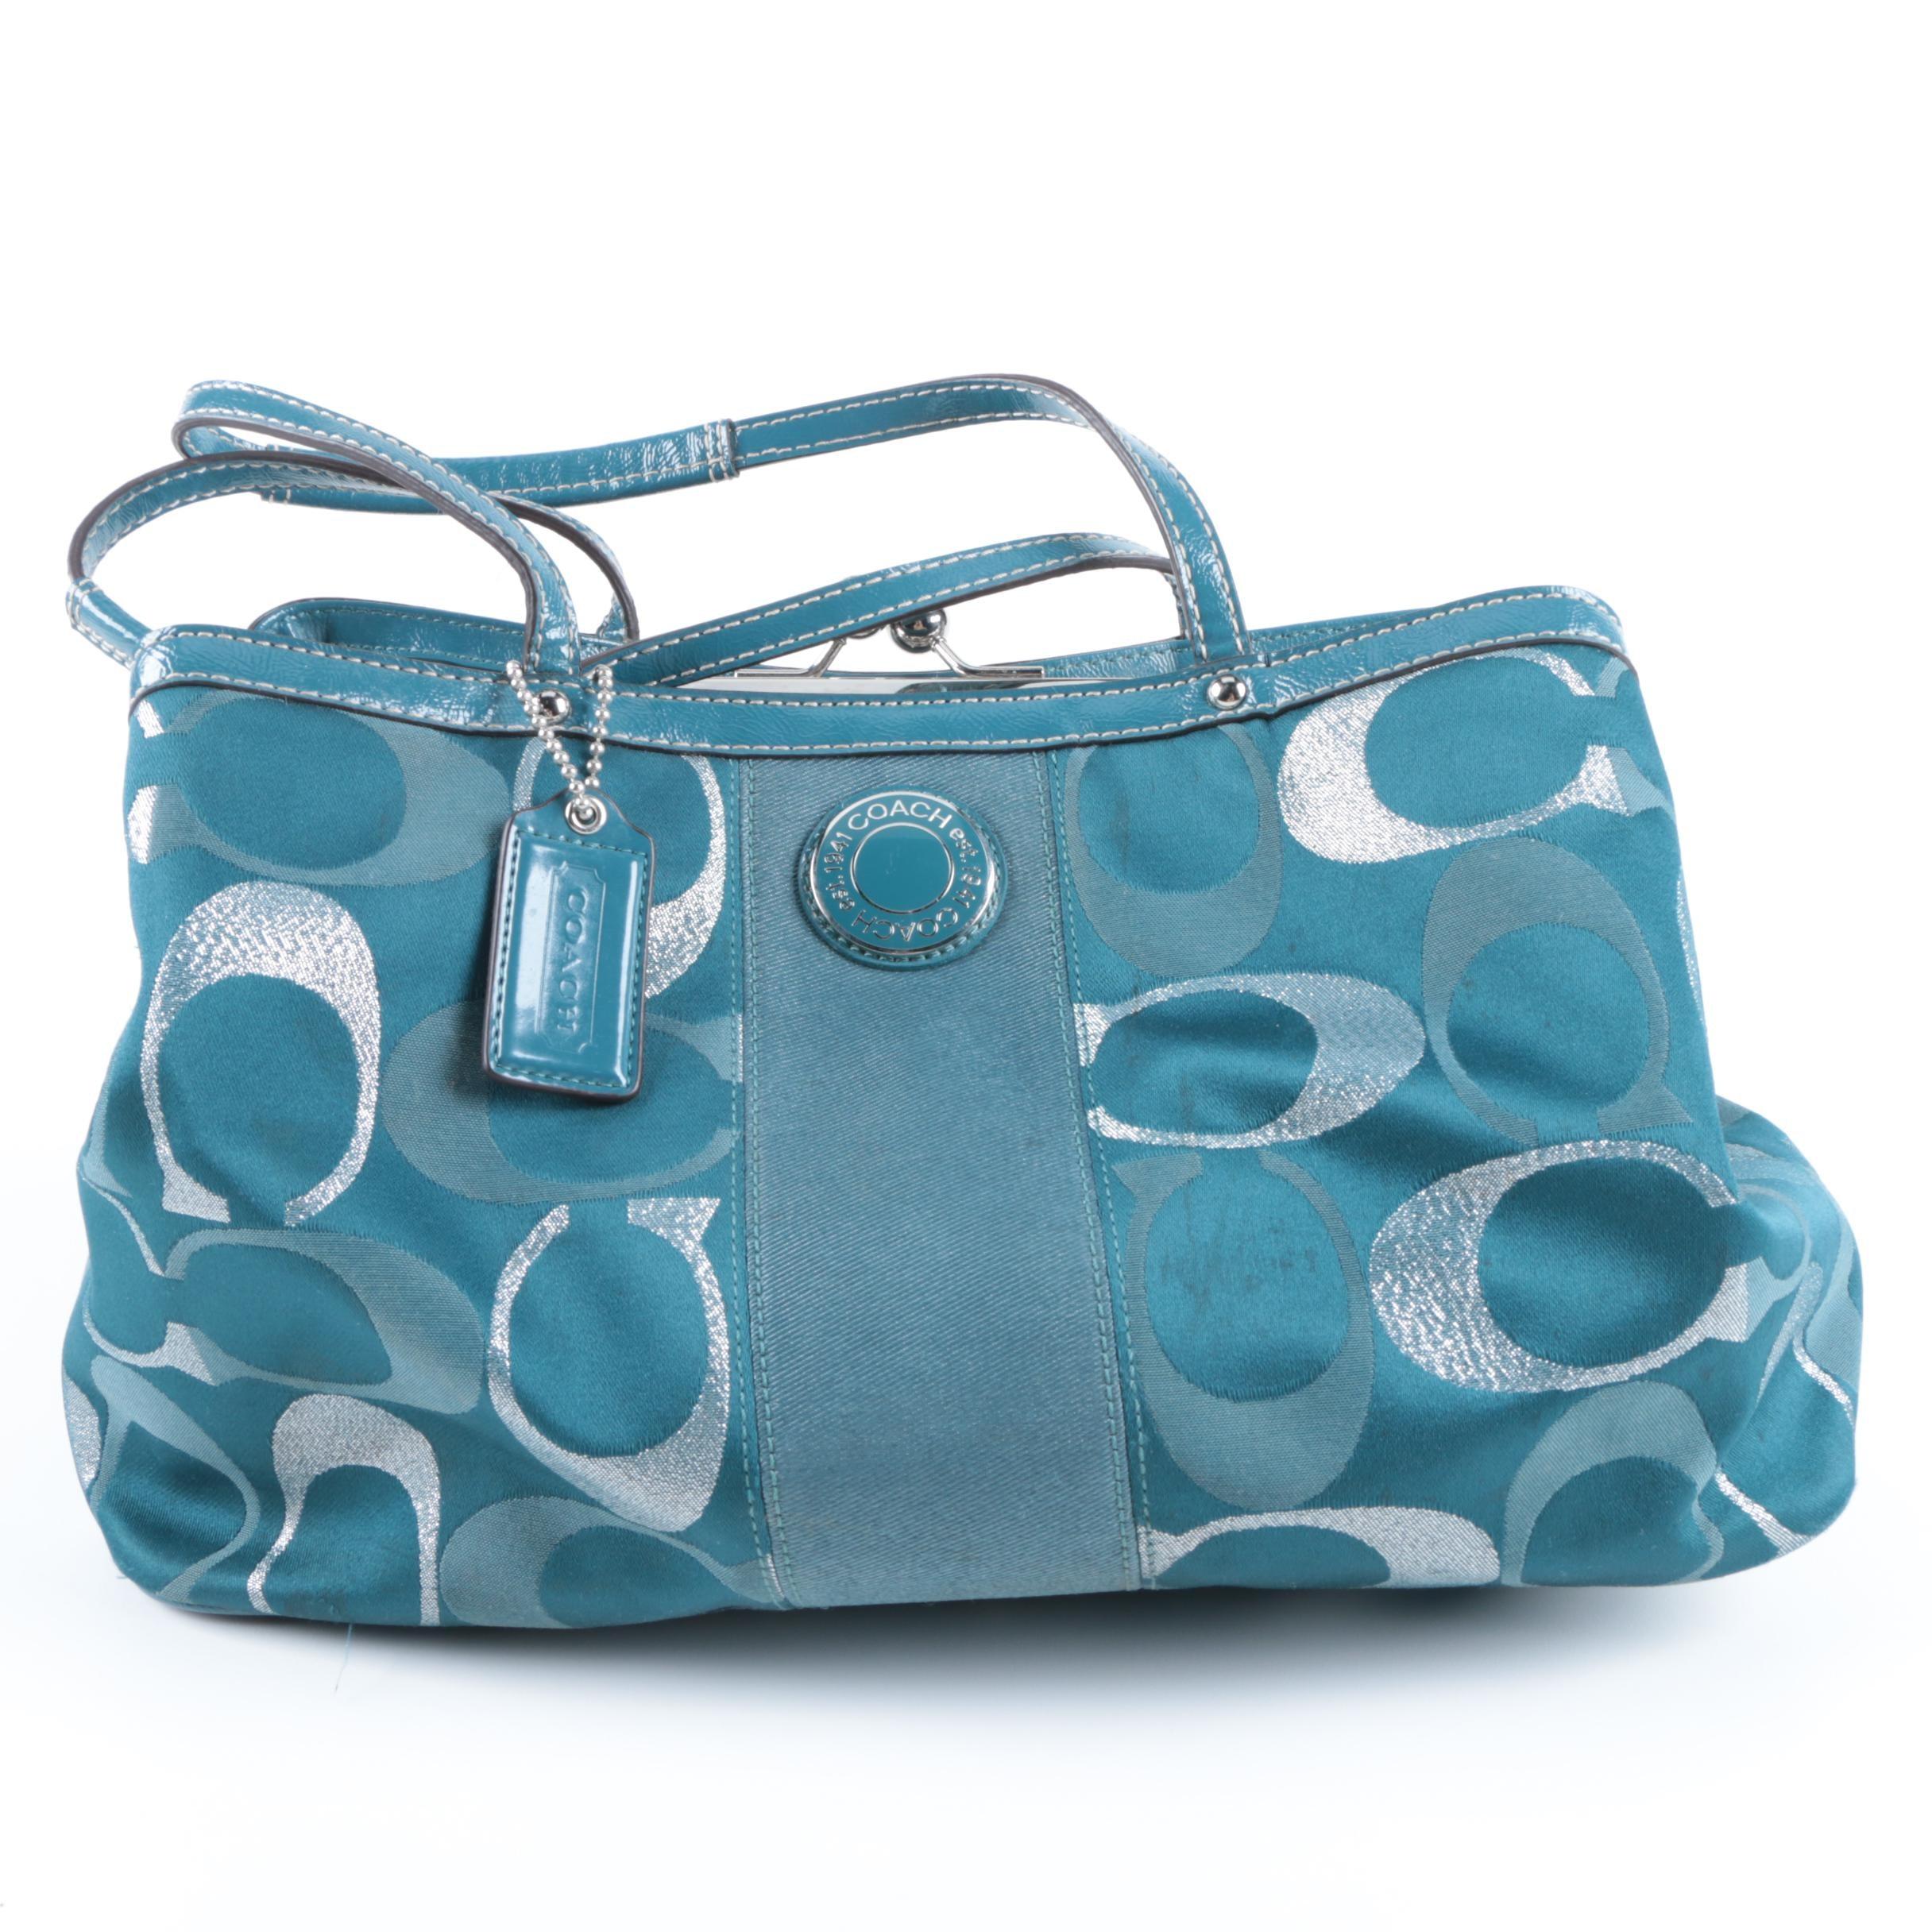 Coach Signature Stripe Teal Canvas Handbag